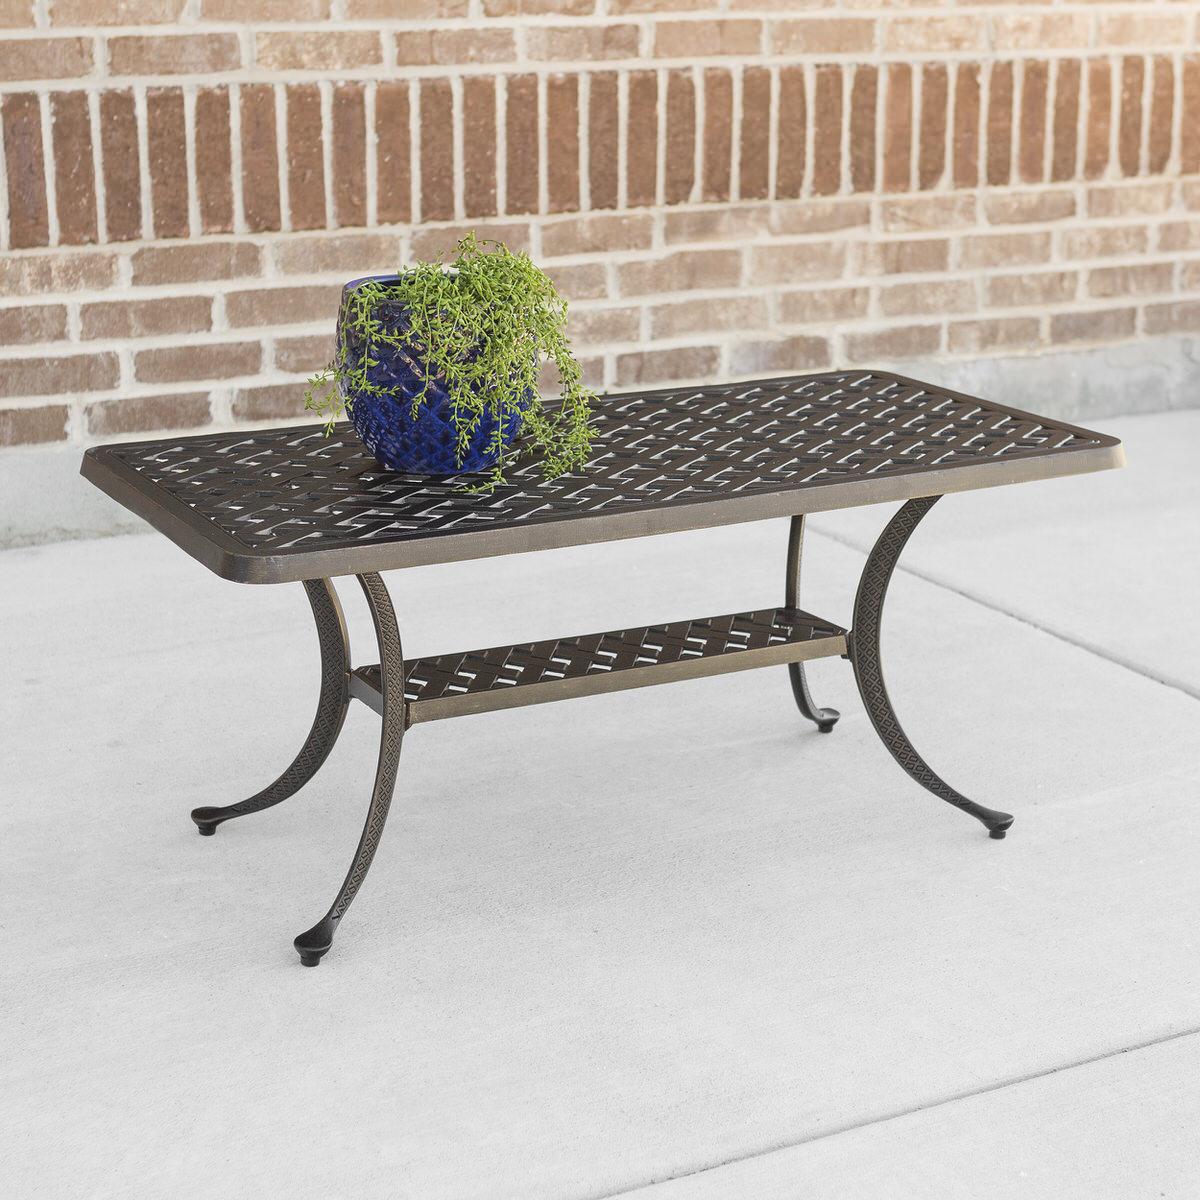 Cast Aluminum Wicker Style Coffee Table   Antique Bronze By Walker Edison